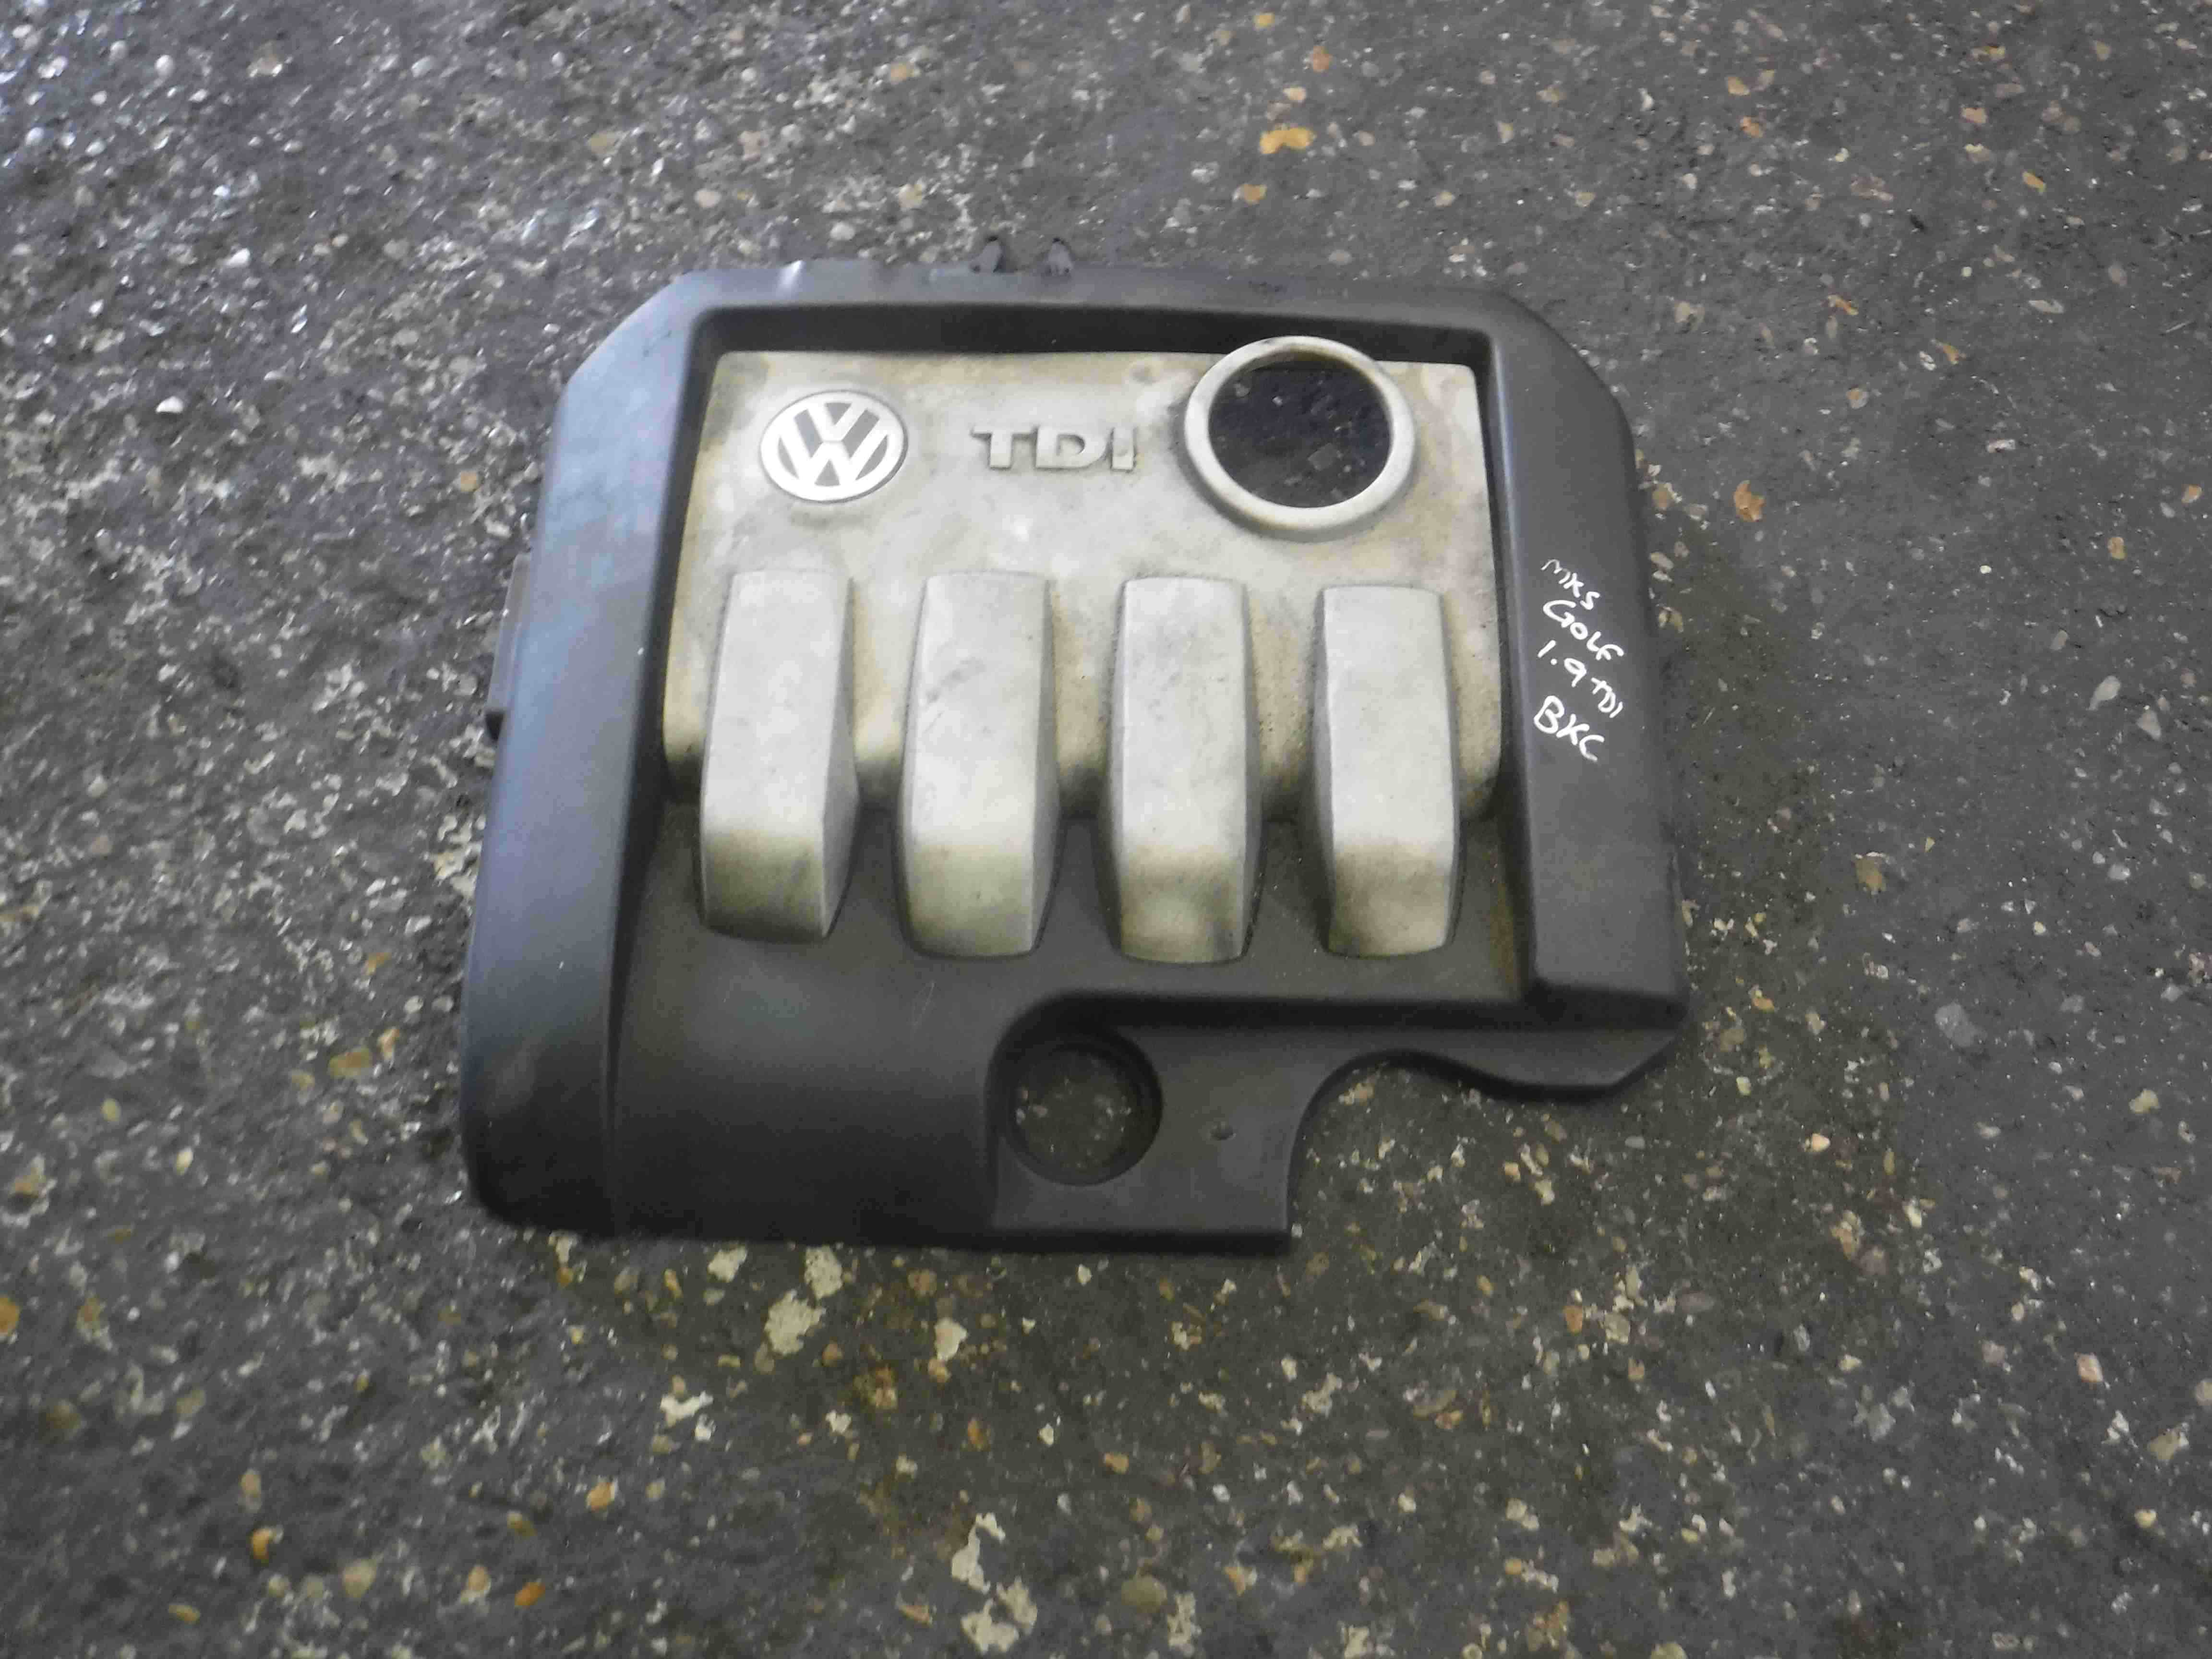 Volkswagen Golf MK4 1997-2004 1.9 TDi Engine Cover Plastic 03G103925AN